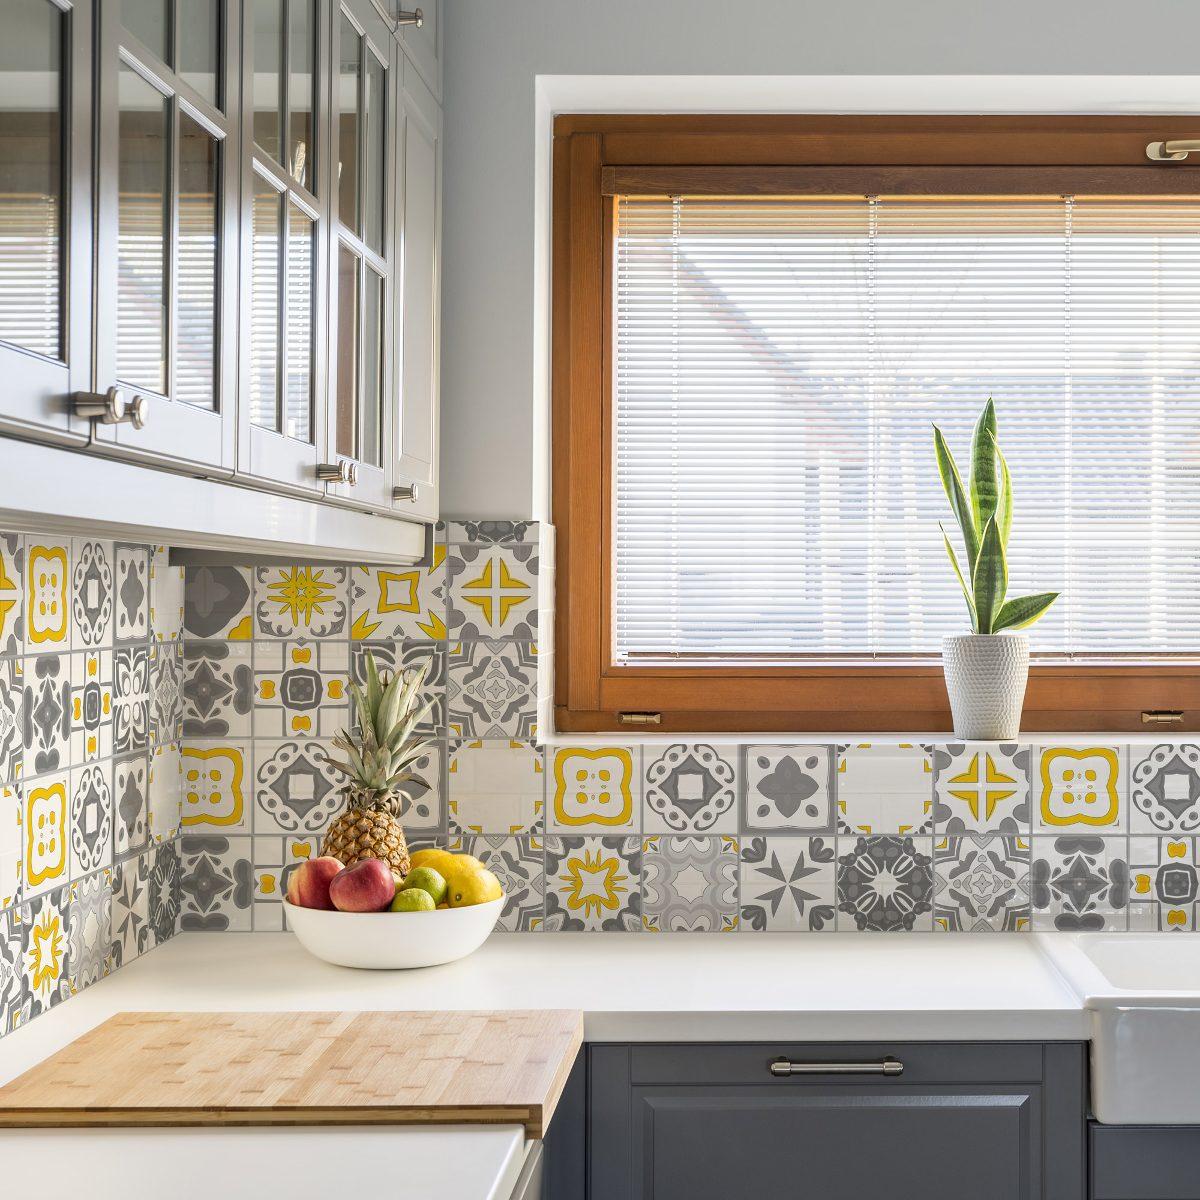 Adesivo azulejo cozinha 15x15 36un vigo amarelo e cinza - Azulejo 15x15 ...